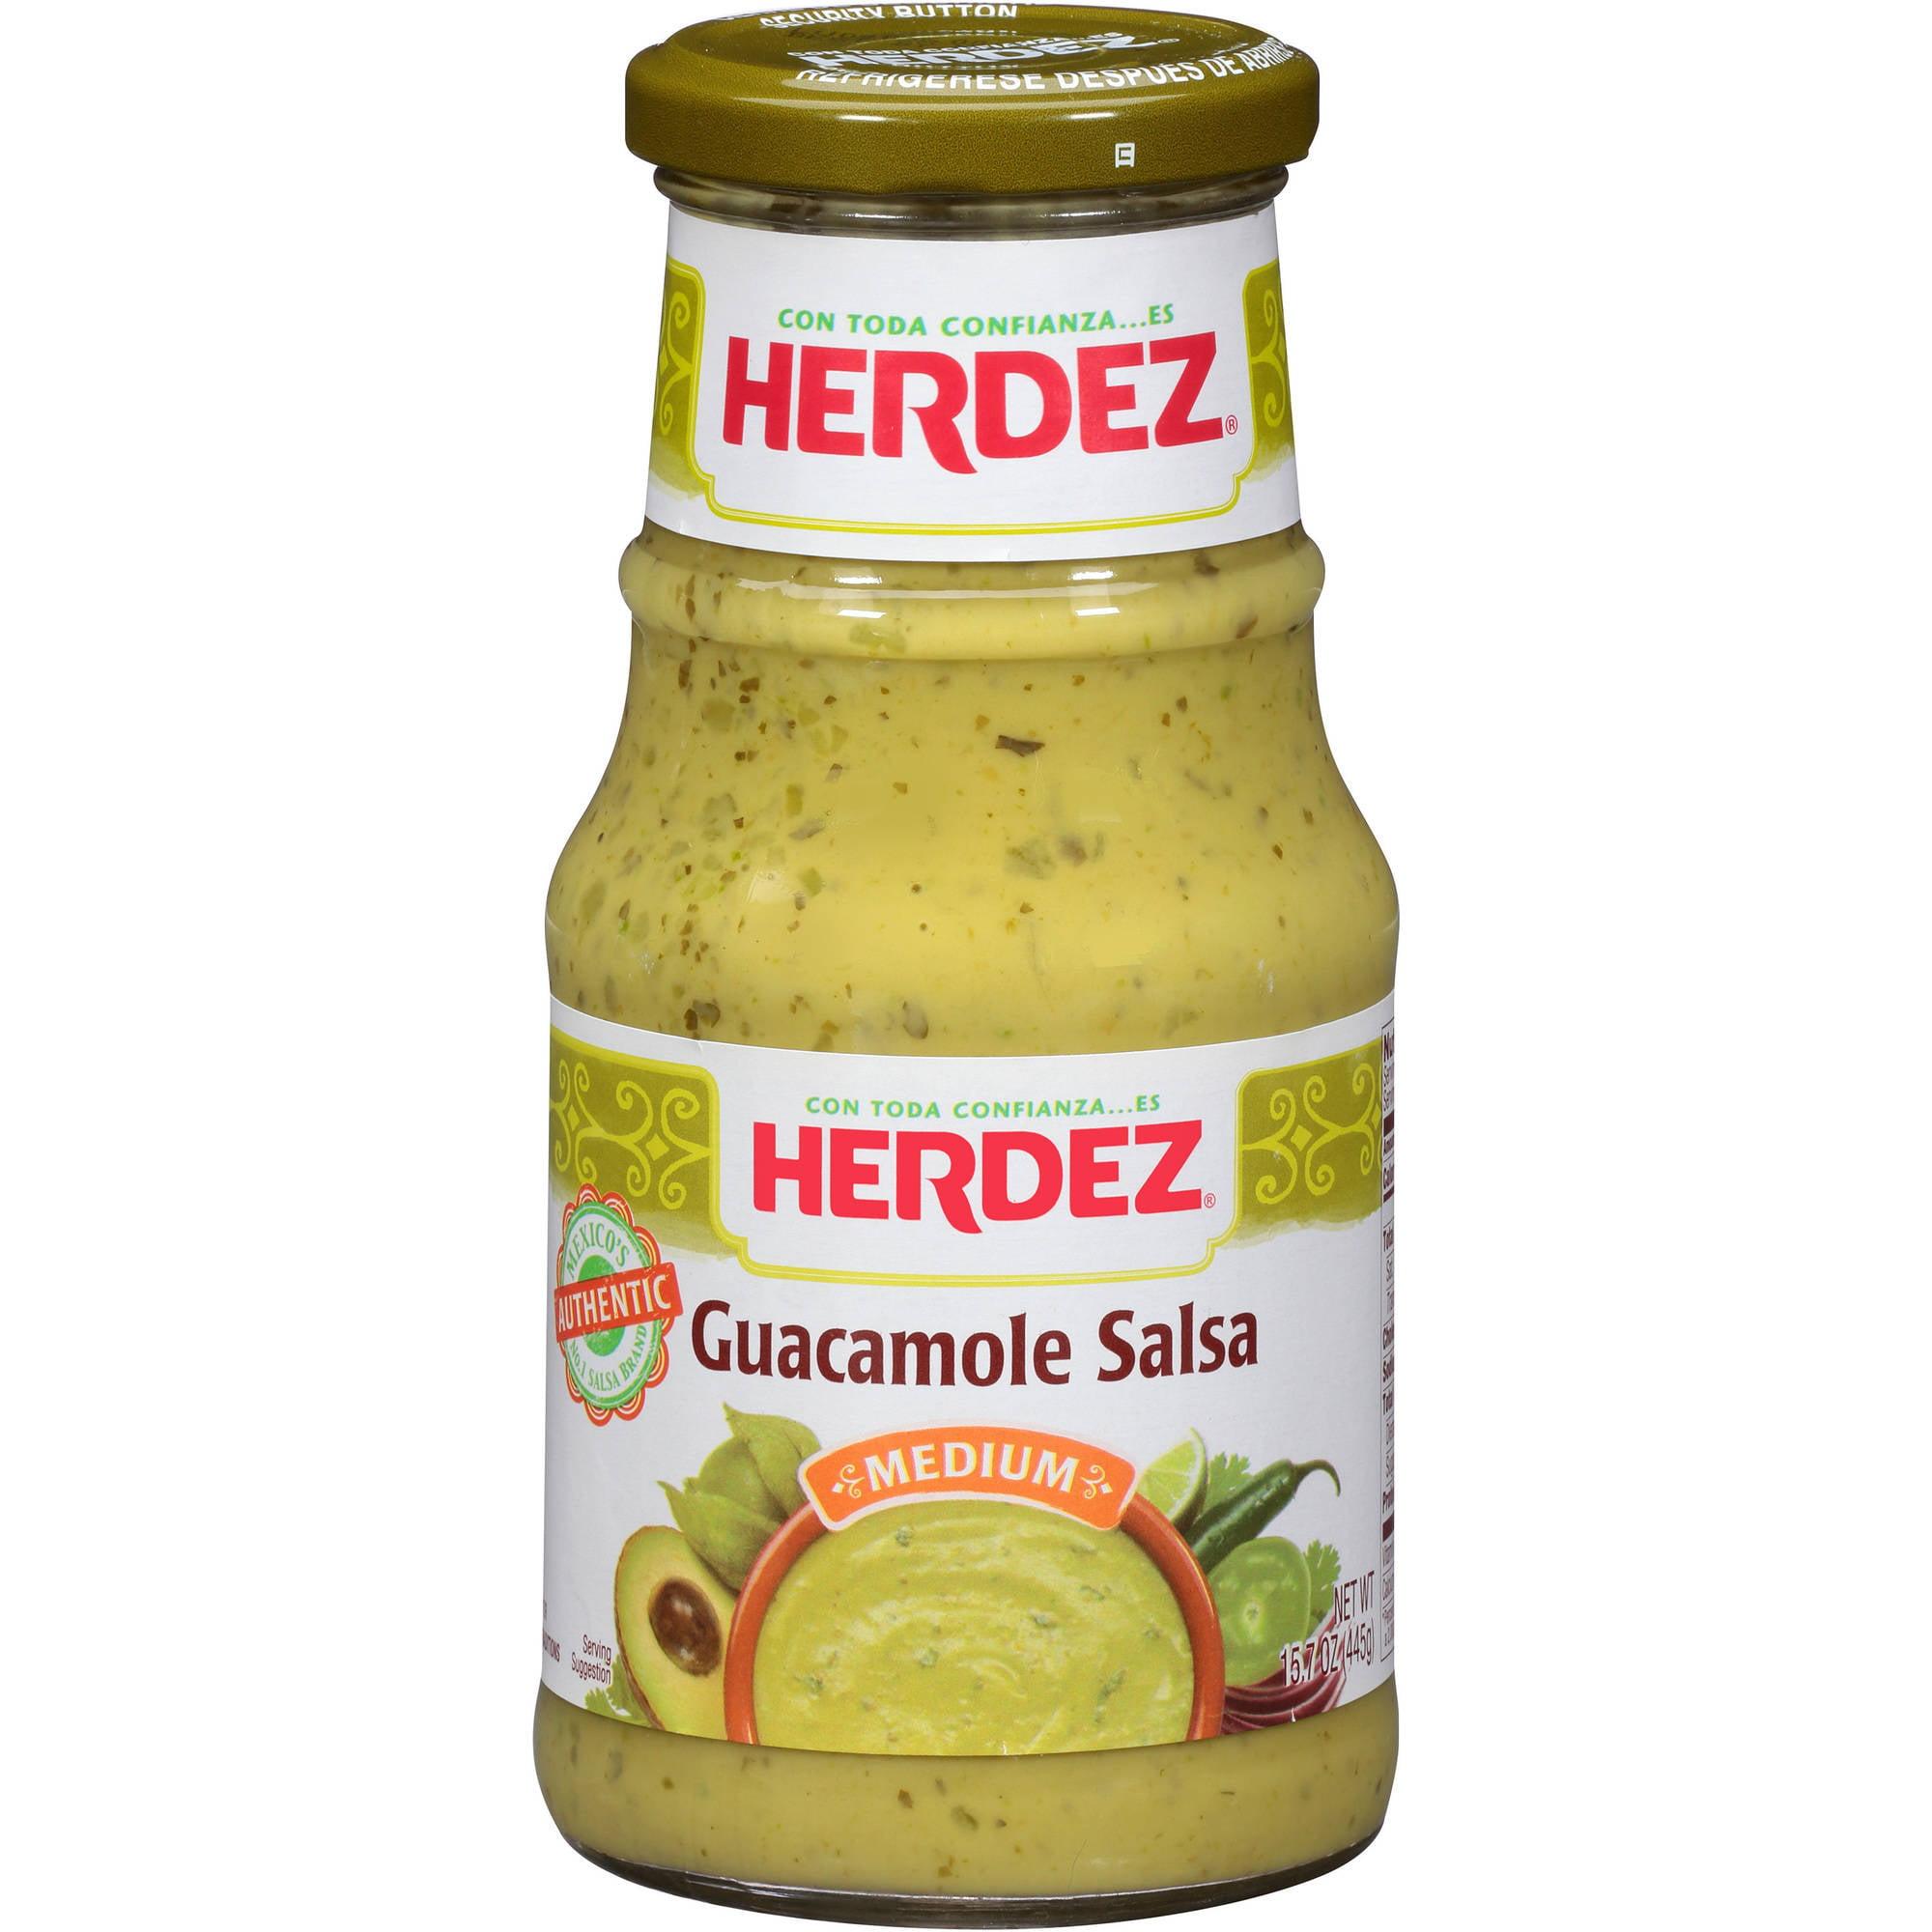 (2 Pack) Herdez Medium Guacamole Salsa, 15.7 oz